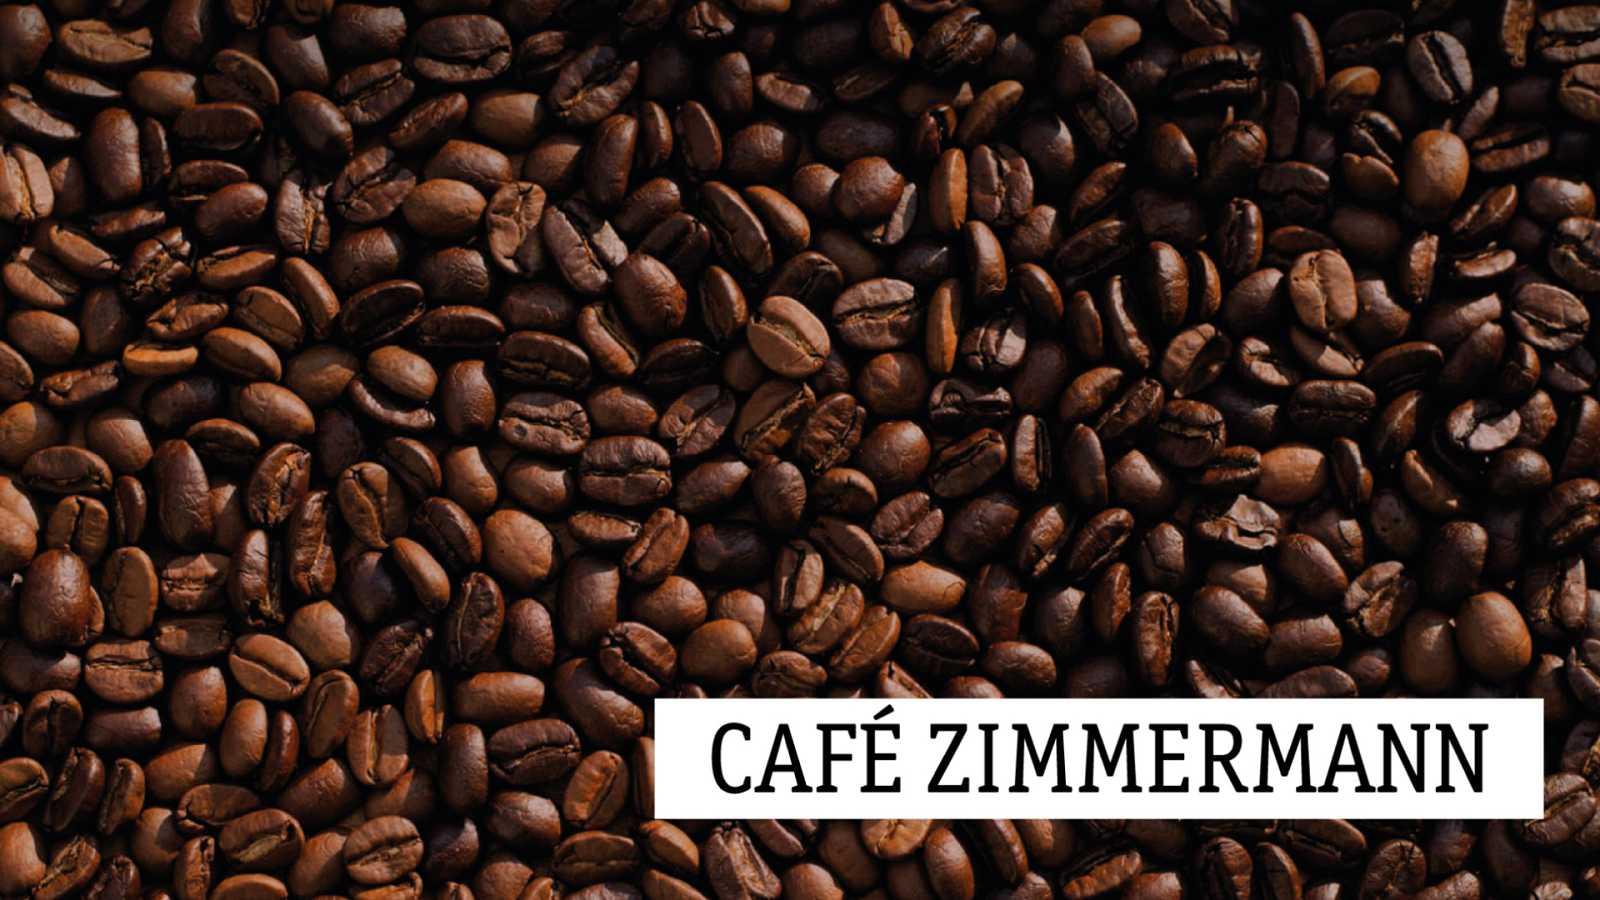 Café Zimmermann - Expreso a Dortmund - 18/01/21 - escuchar ahora